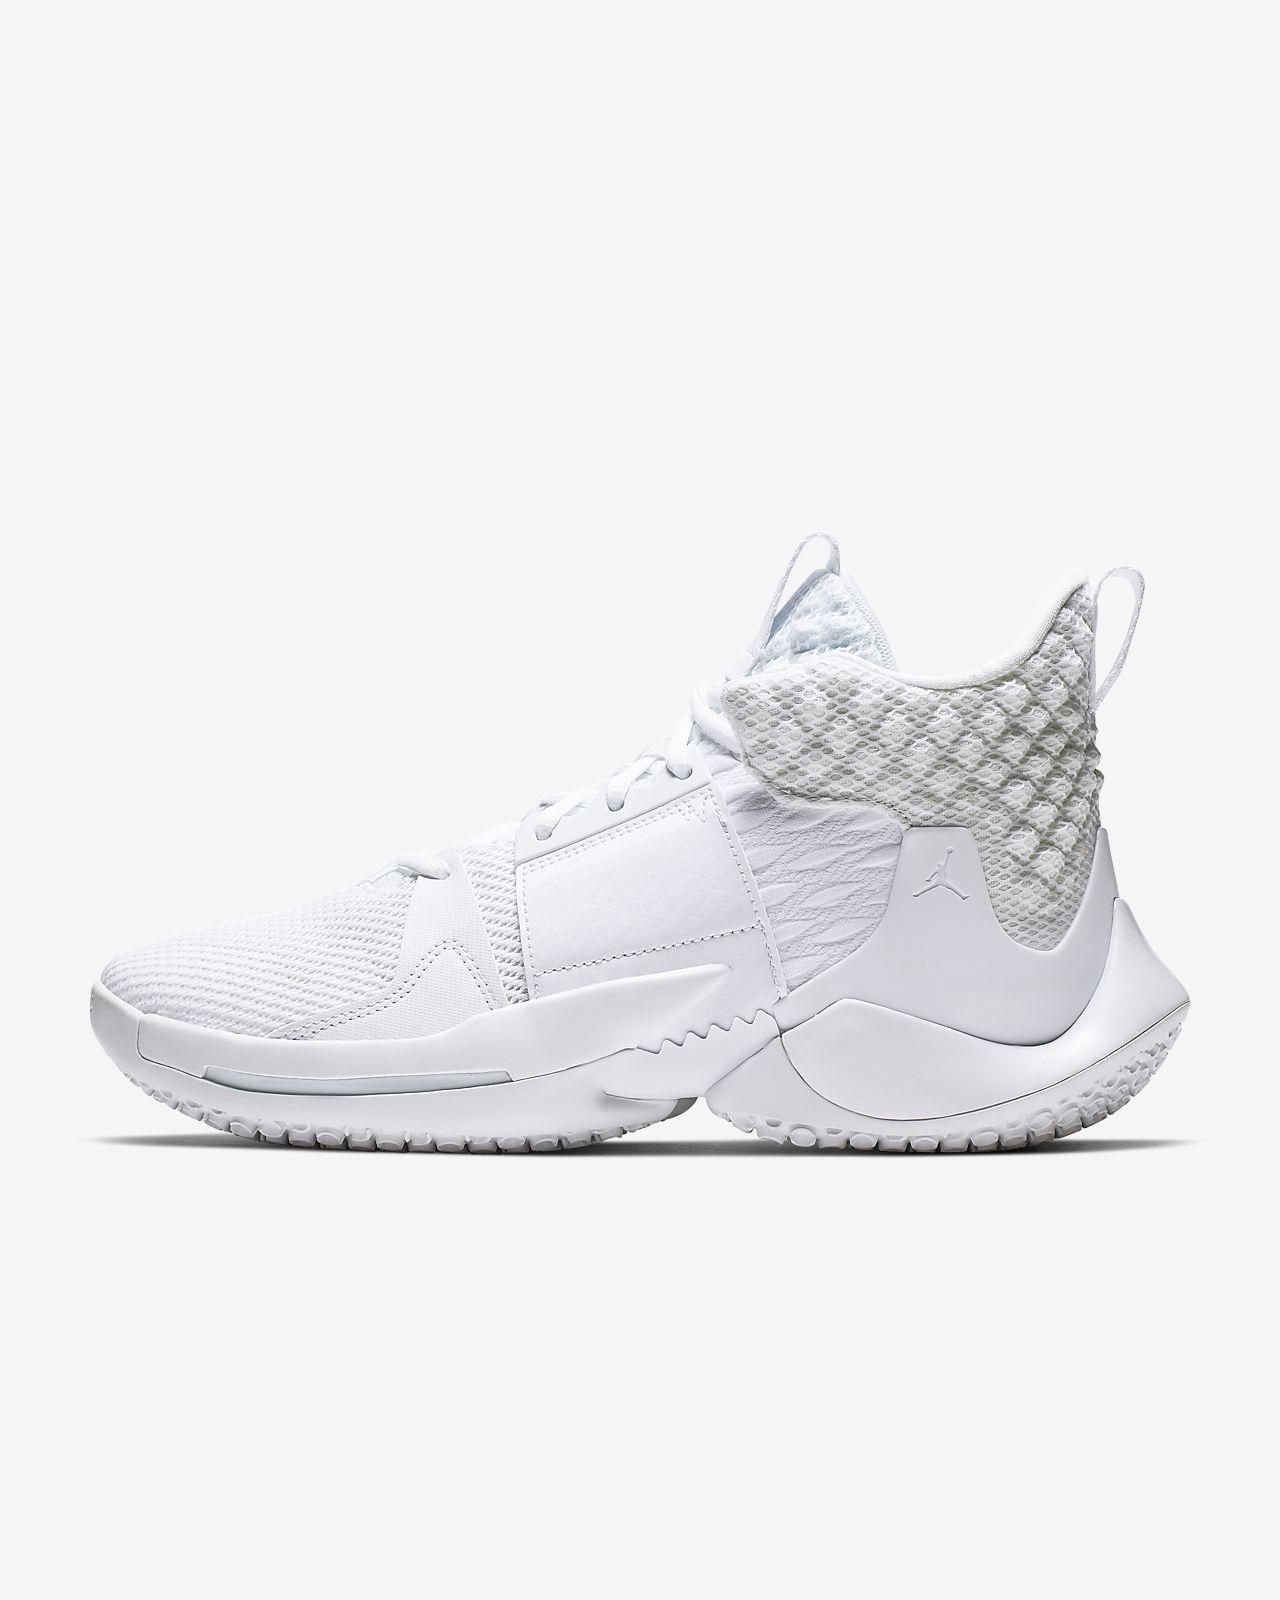 Jordan 'Why Not?' Zer0.2 Basketball Shoe